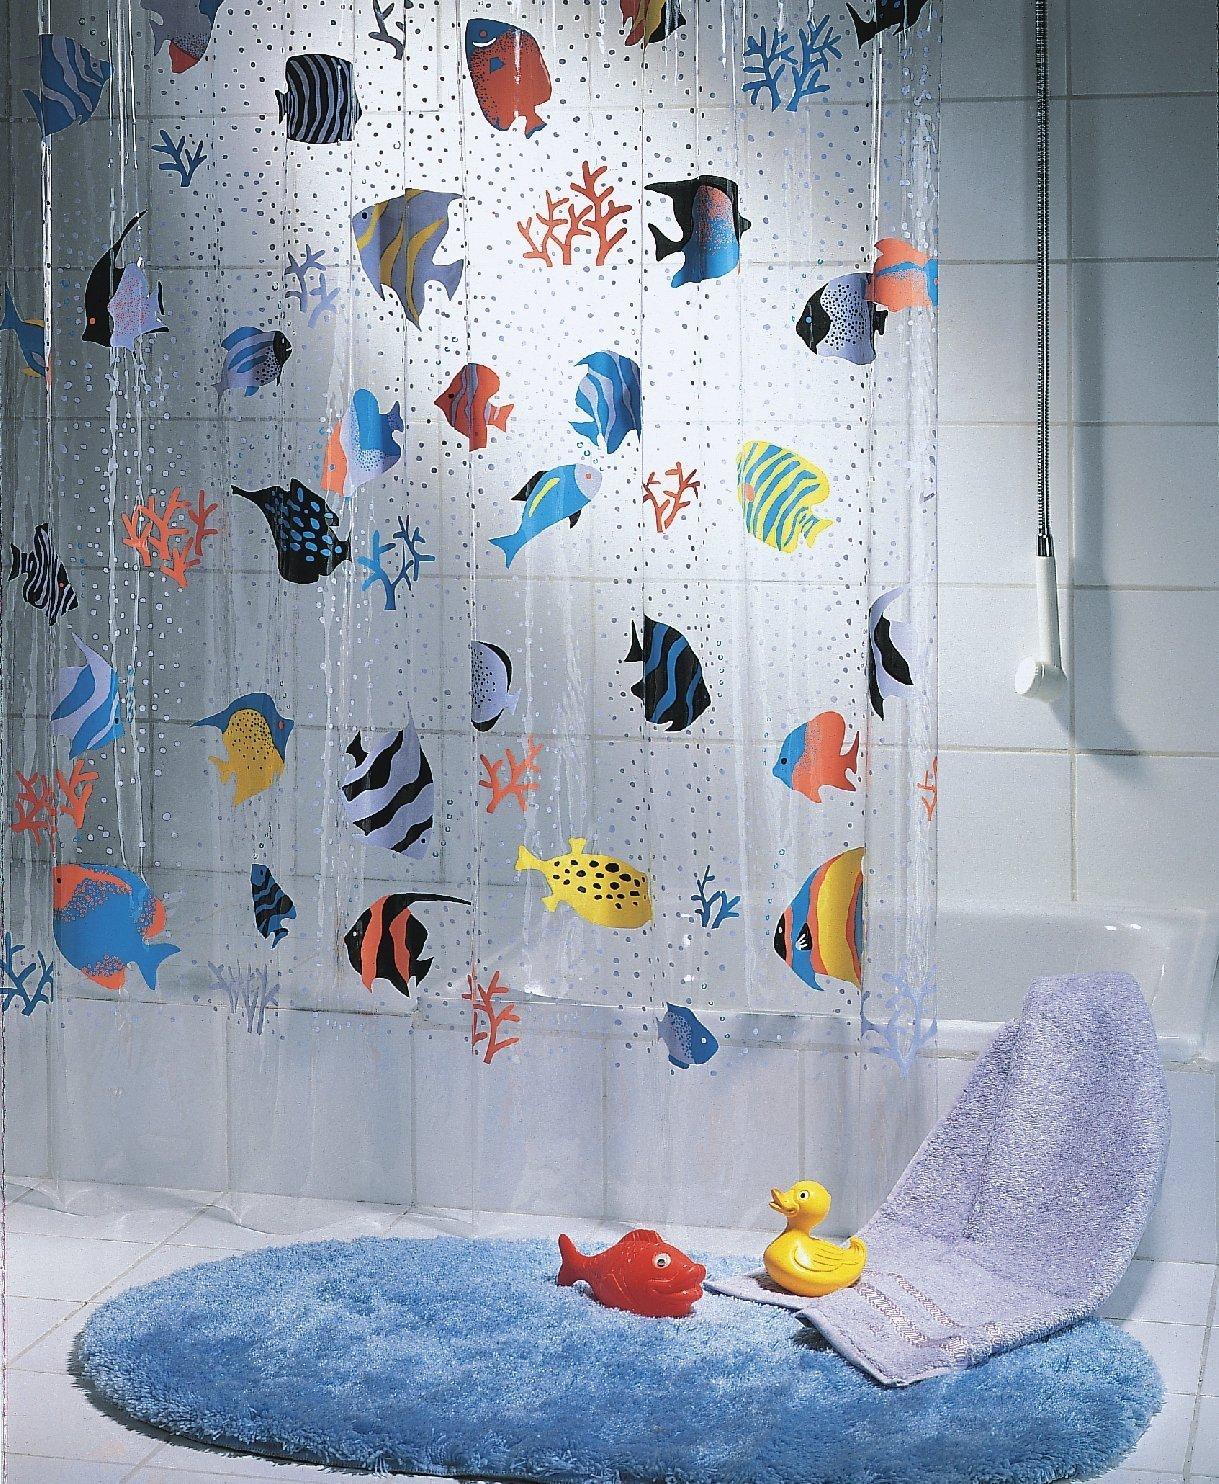 Quality Transparent Fish Clear Plastic Shower Curtain 180 X 200 Cm